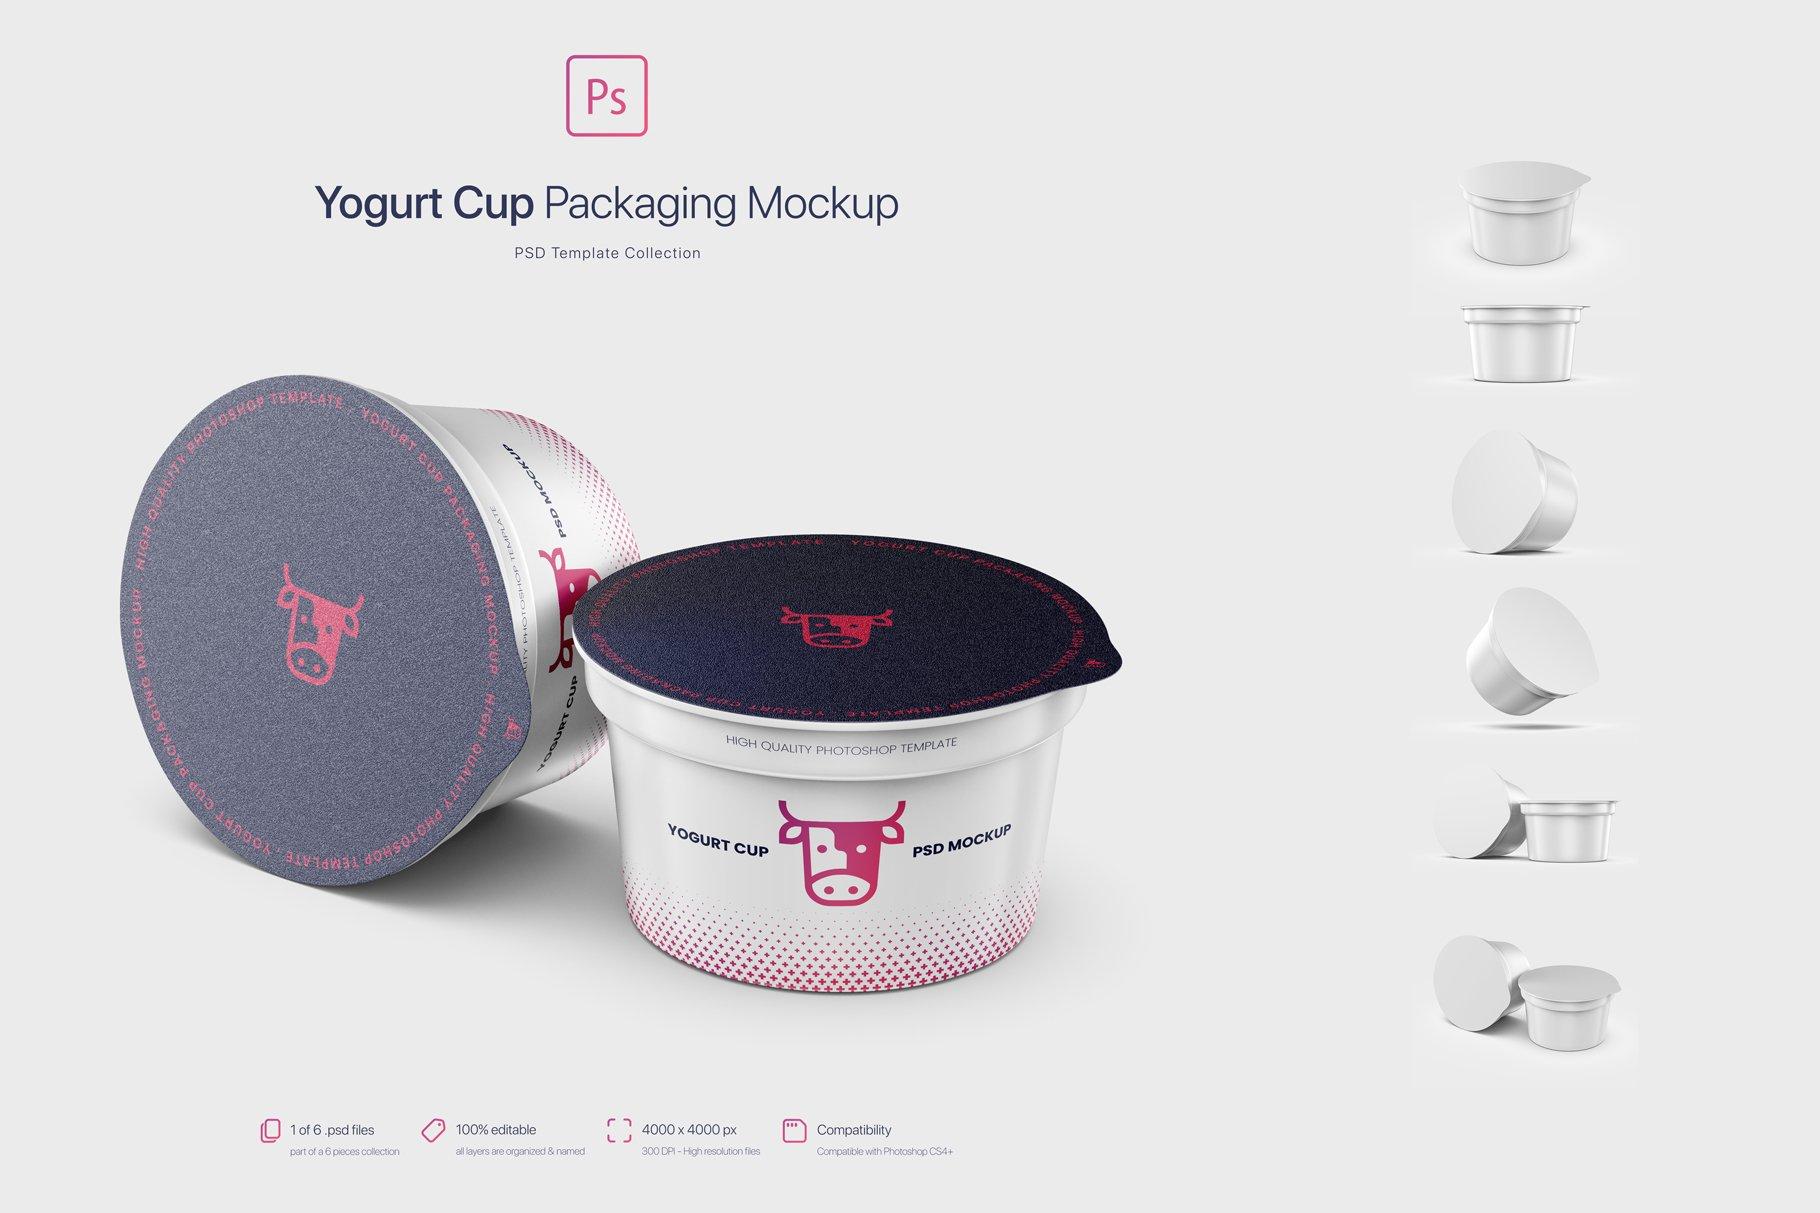 6款逼真高质量酸奶杯设计展示样机 Yogurt Cup Packaging Mockup插图4